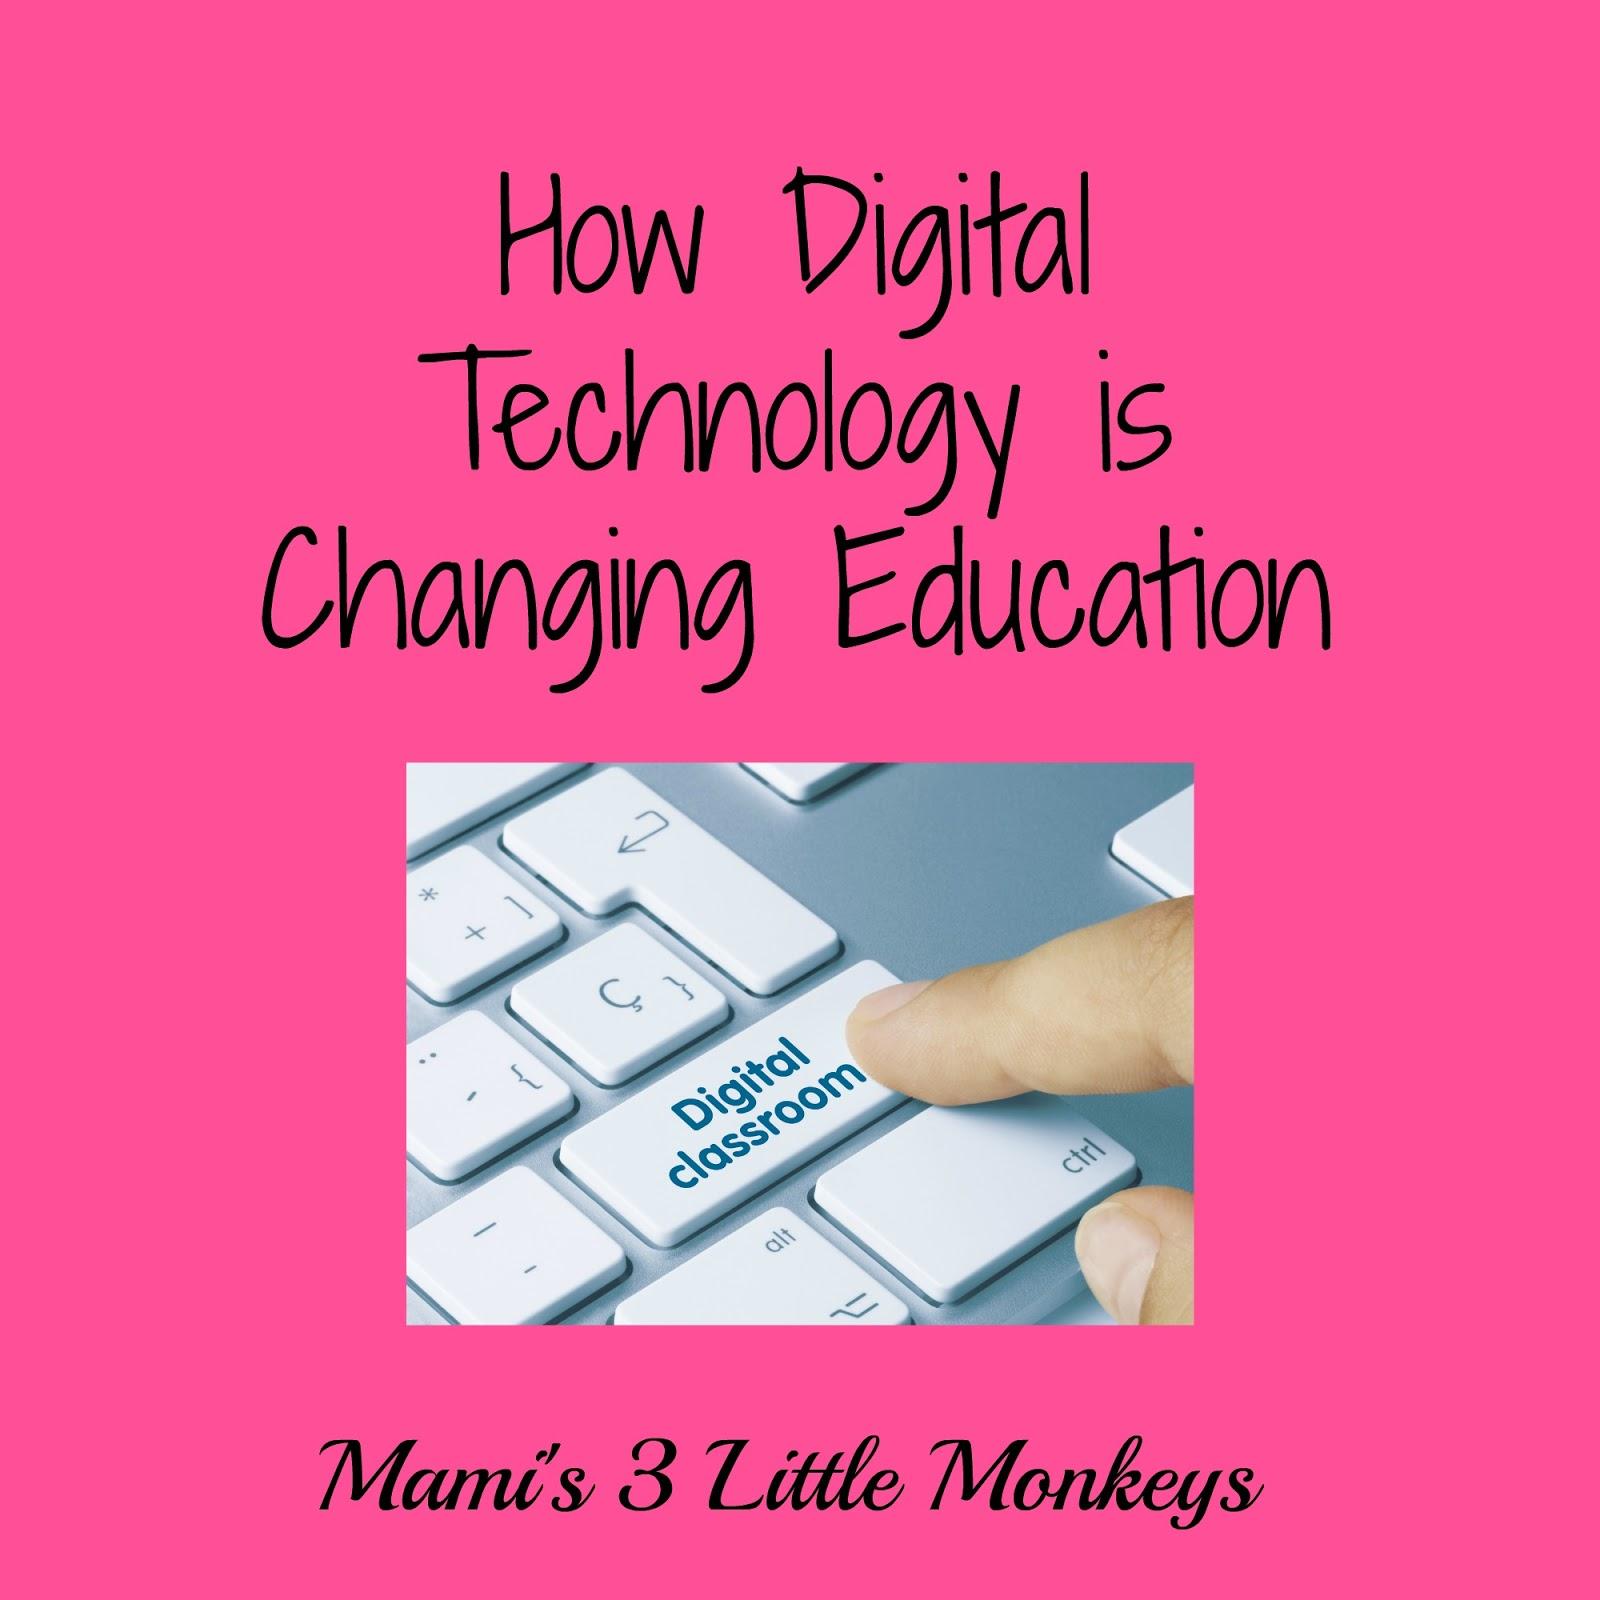 Mami's 3 Little Monkeys: Guest Post: How Digital Technology